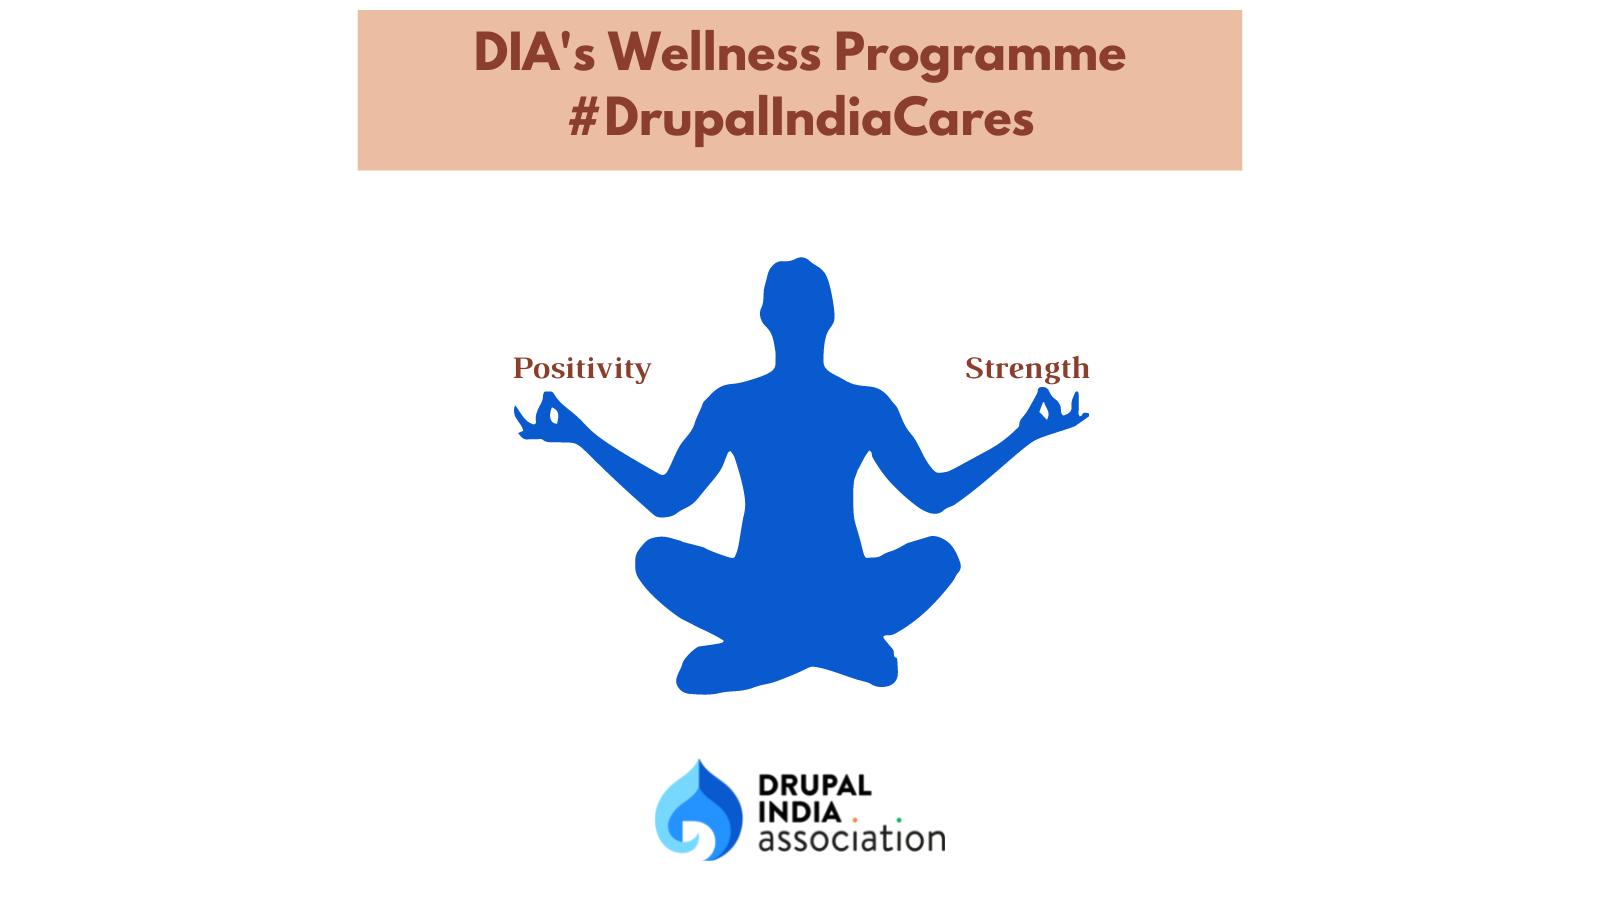 DIA Wellness Programme